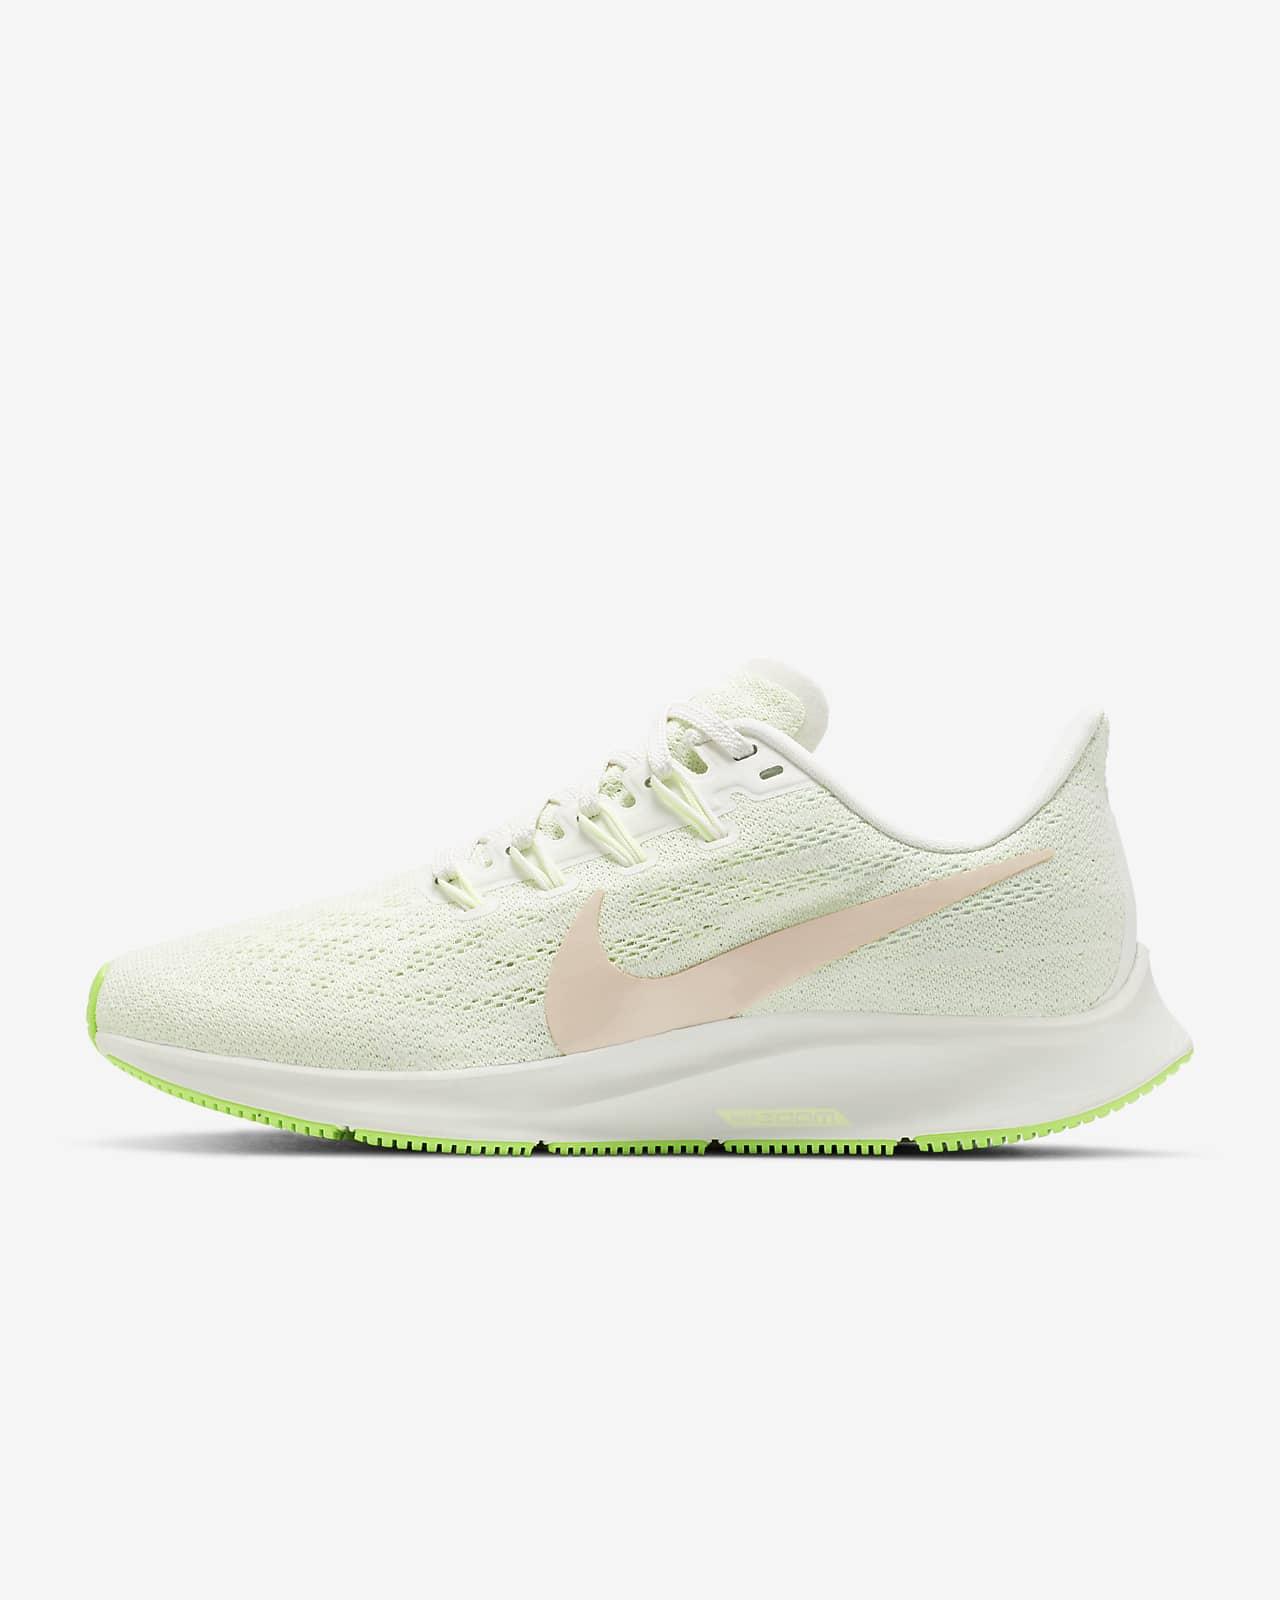 Nike Air Zoom Pegasus 36 Women's Running Shoes